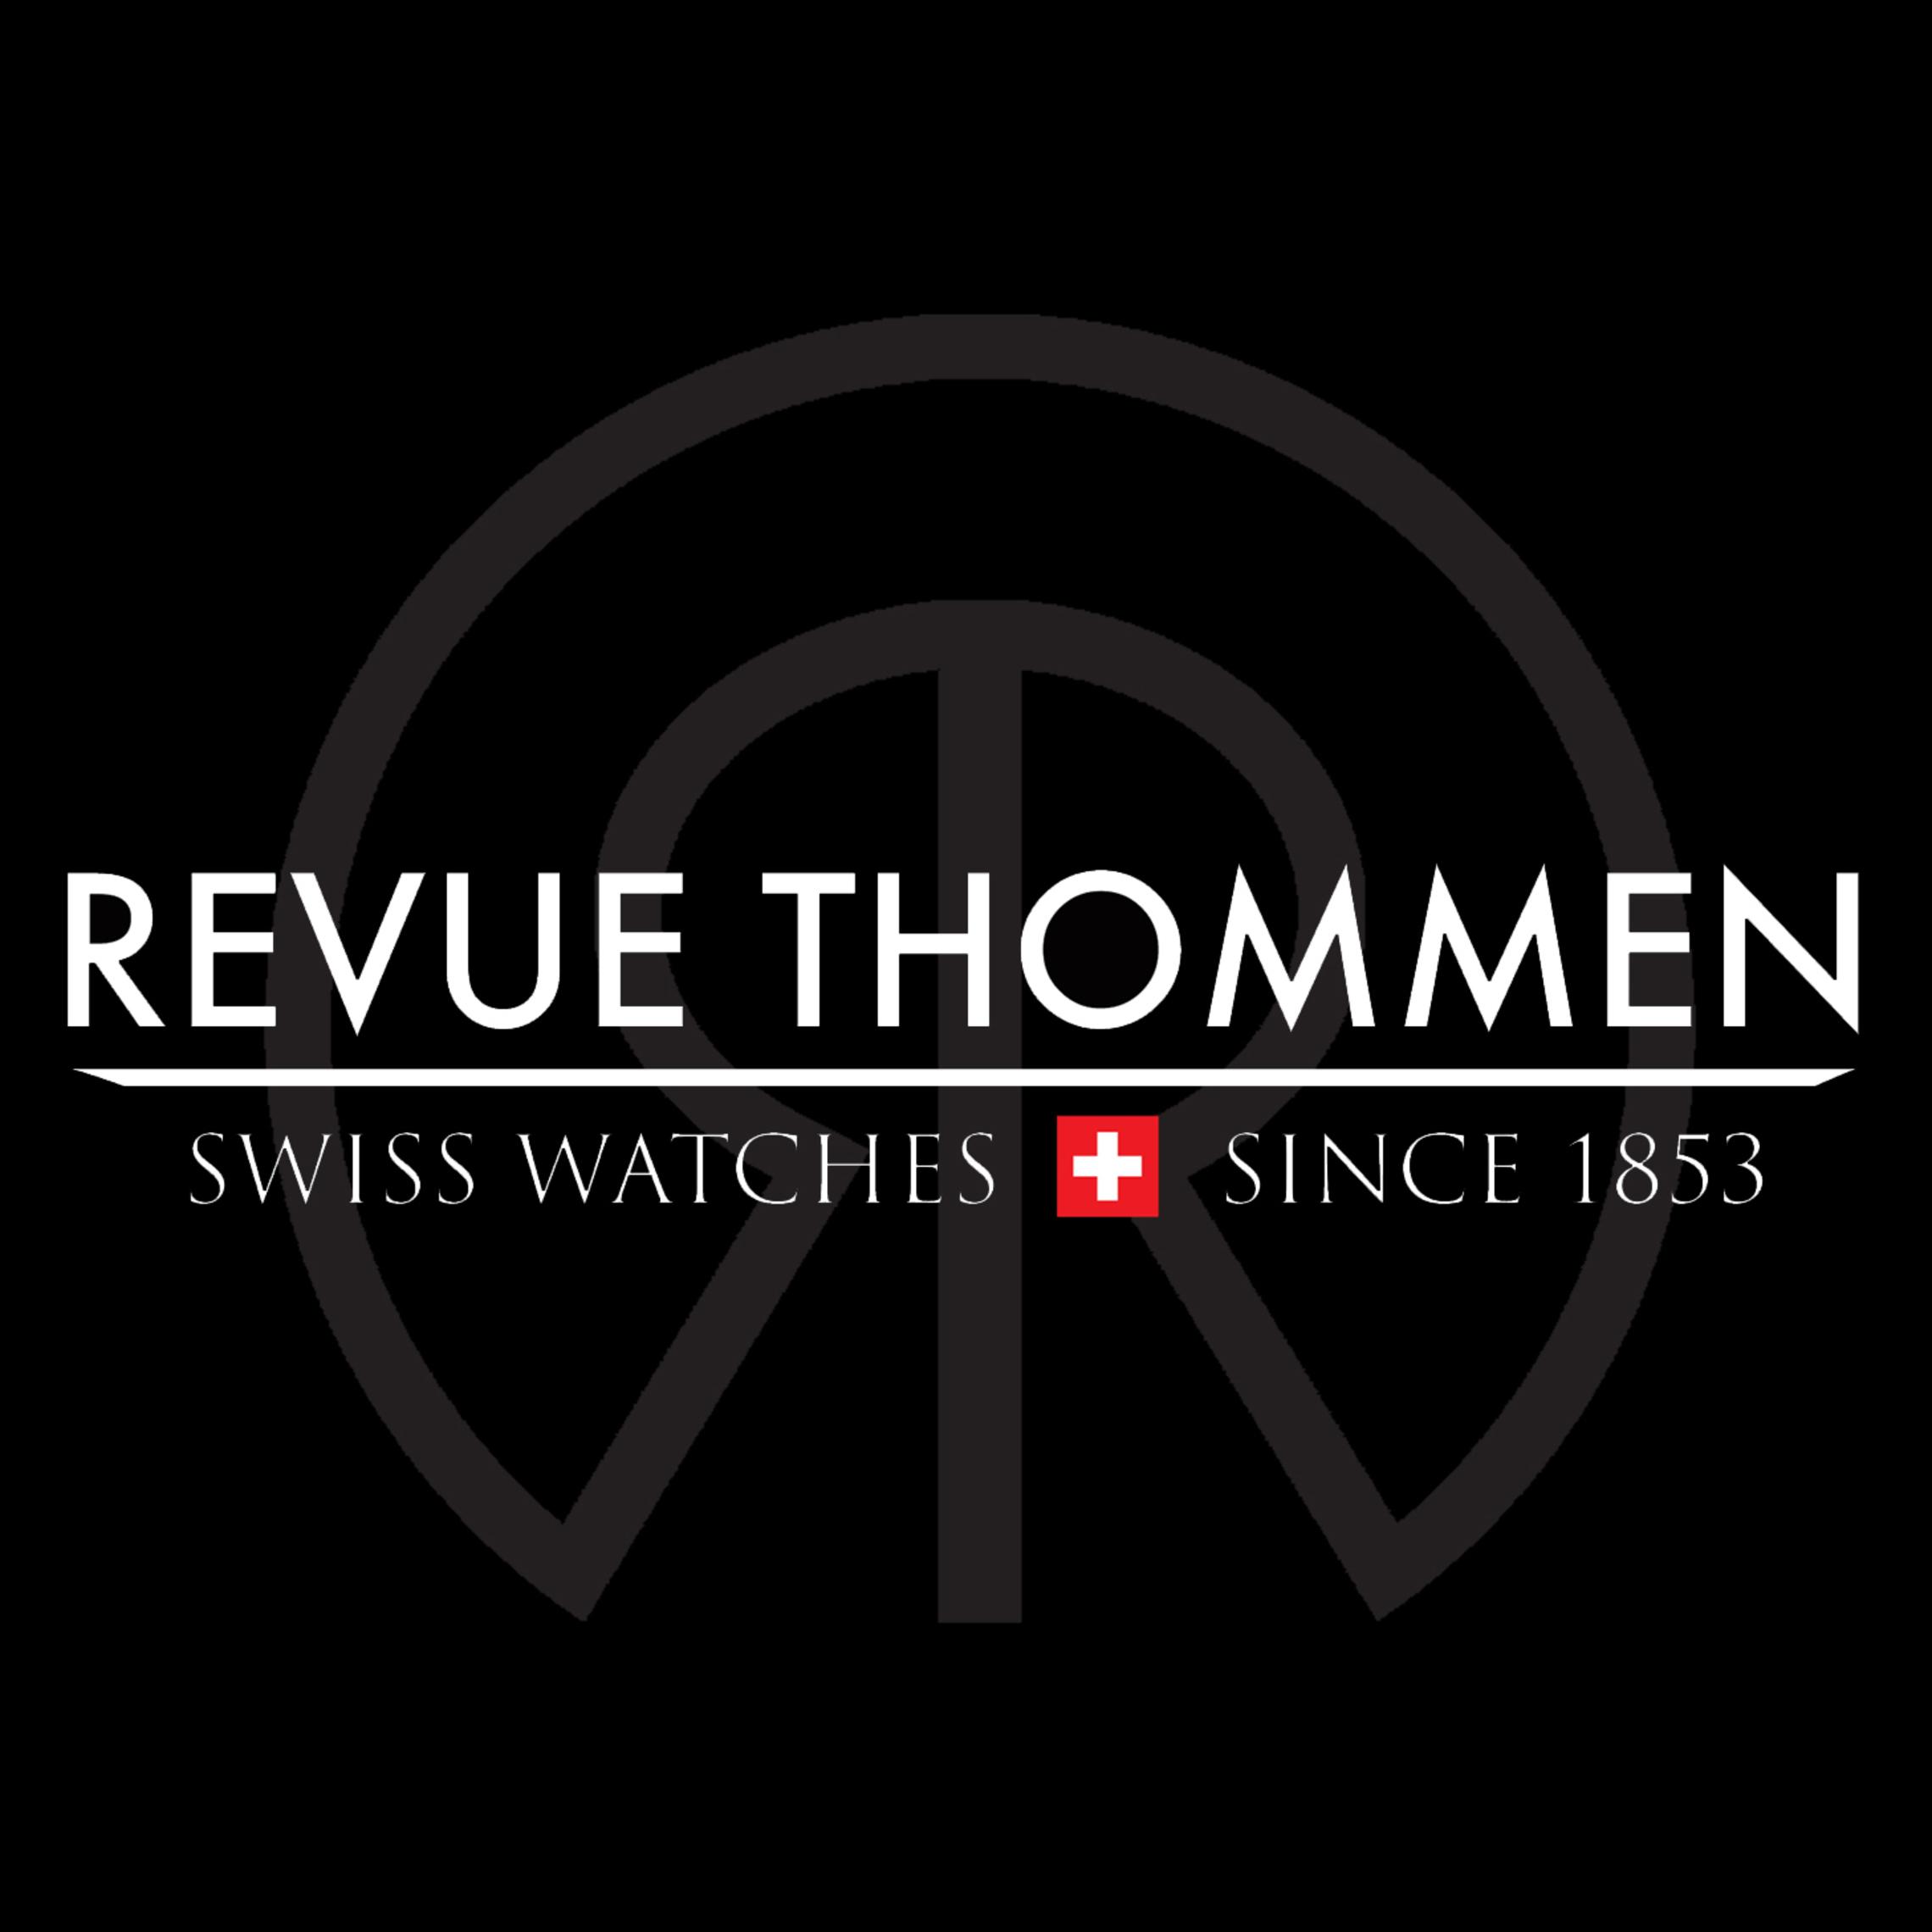 revue thommen- company logo